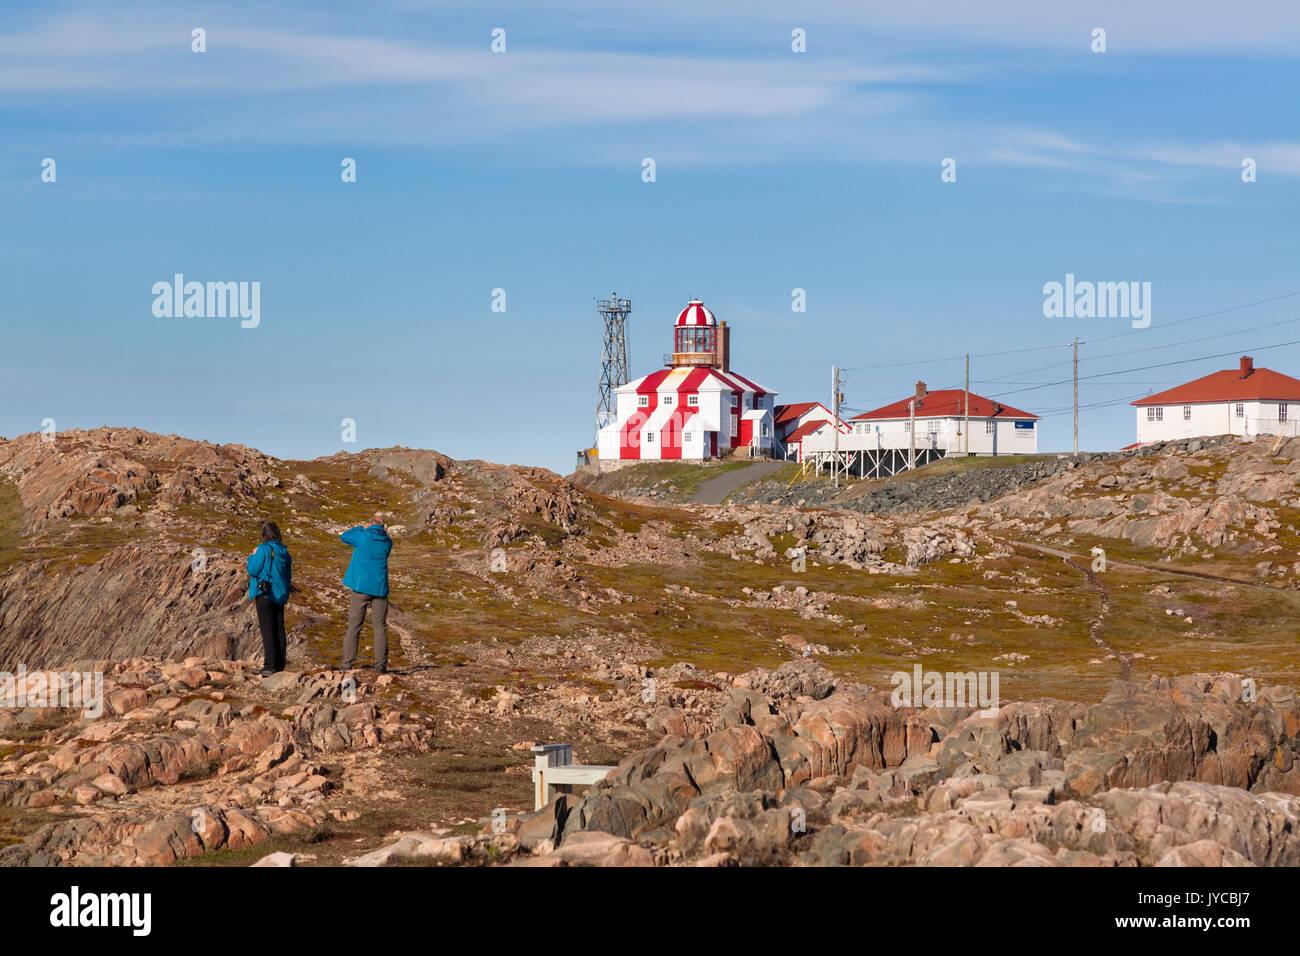 Tourists visiting the Cape Bonavista Lighthouse that is perched atop a rocky landscape in Bonavista,, Newfoundland and Labrador, Canada. - Stock Image